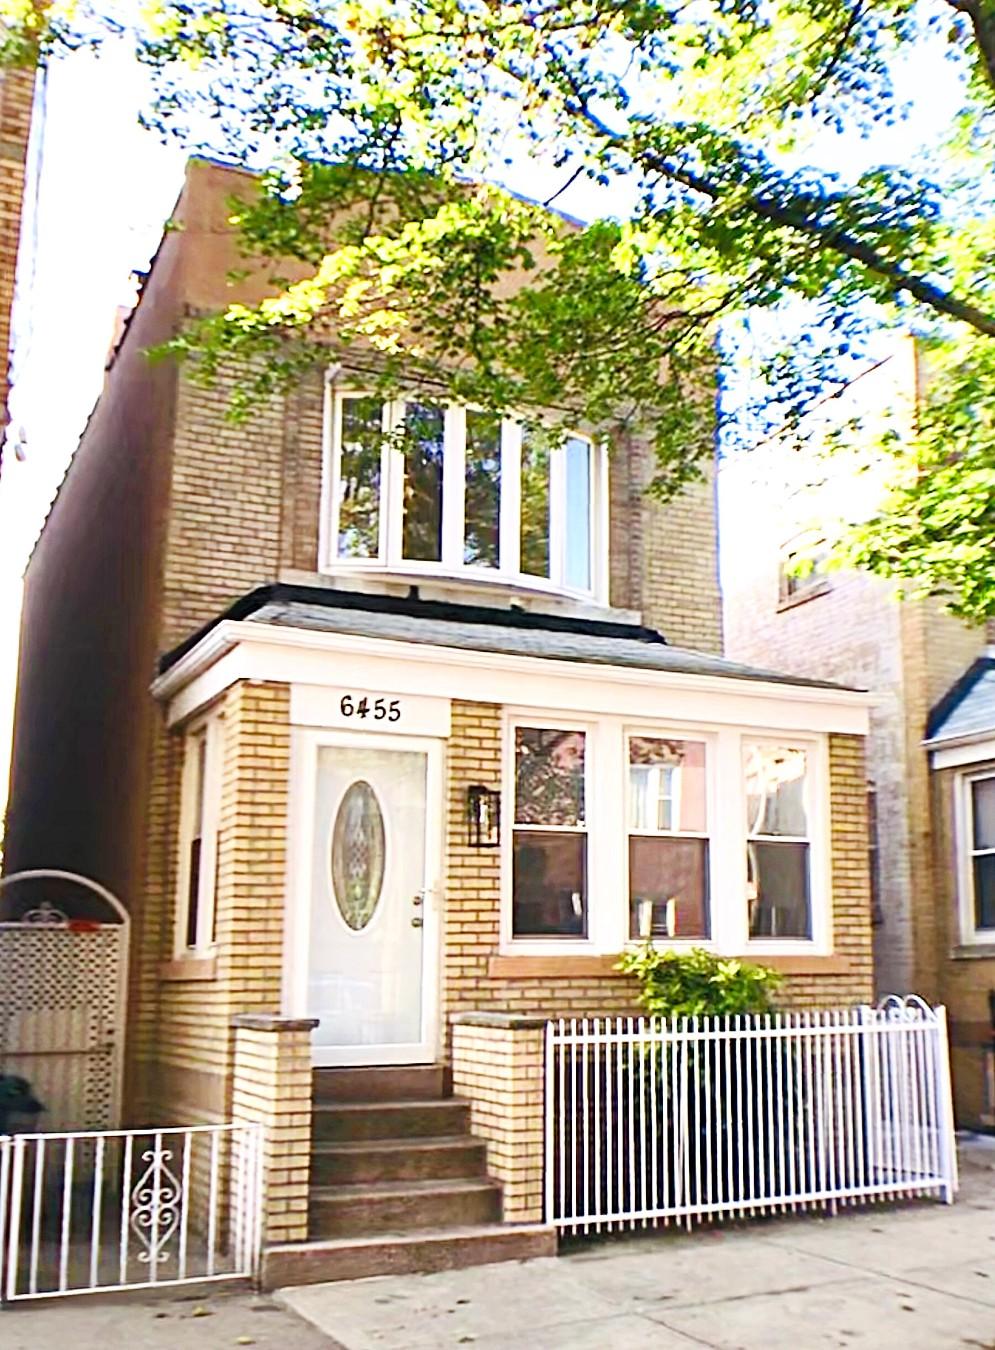 3 House in Ridgewood